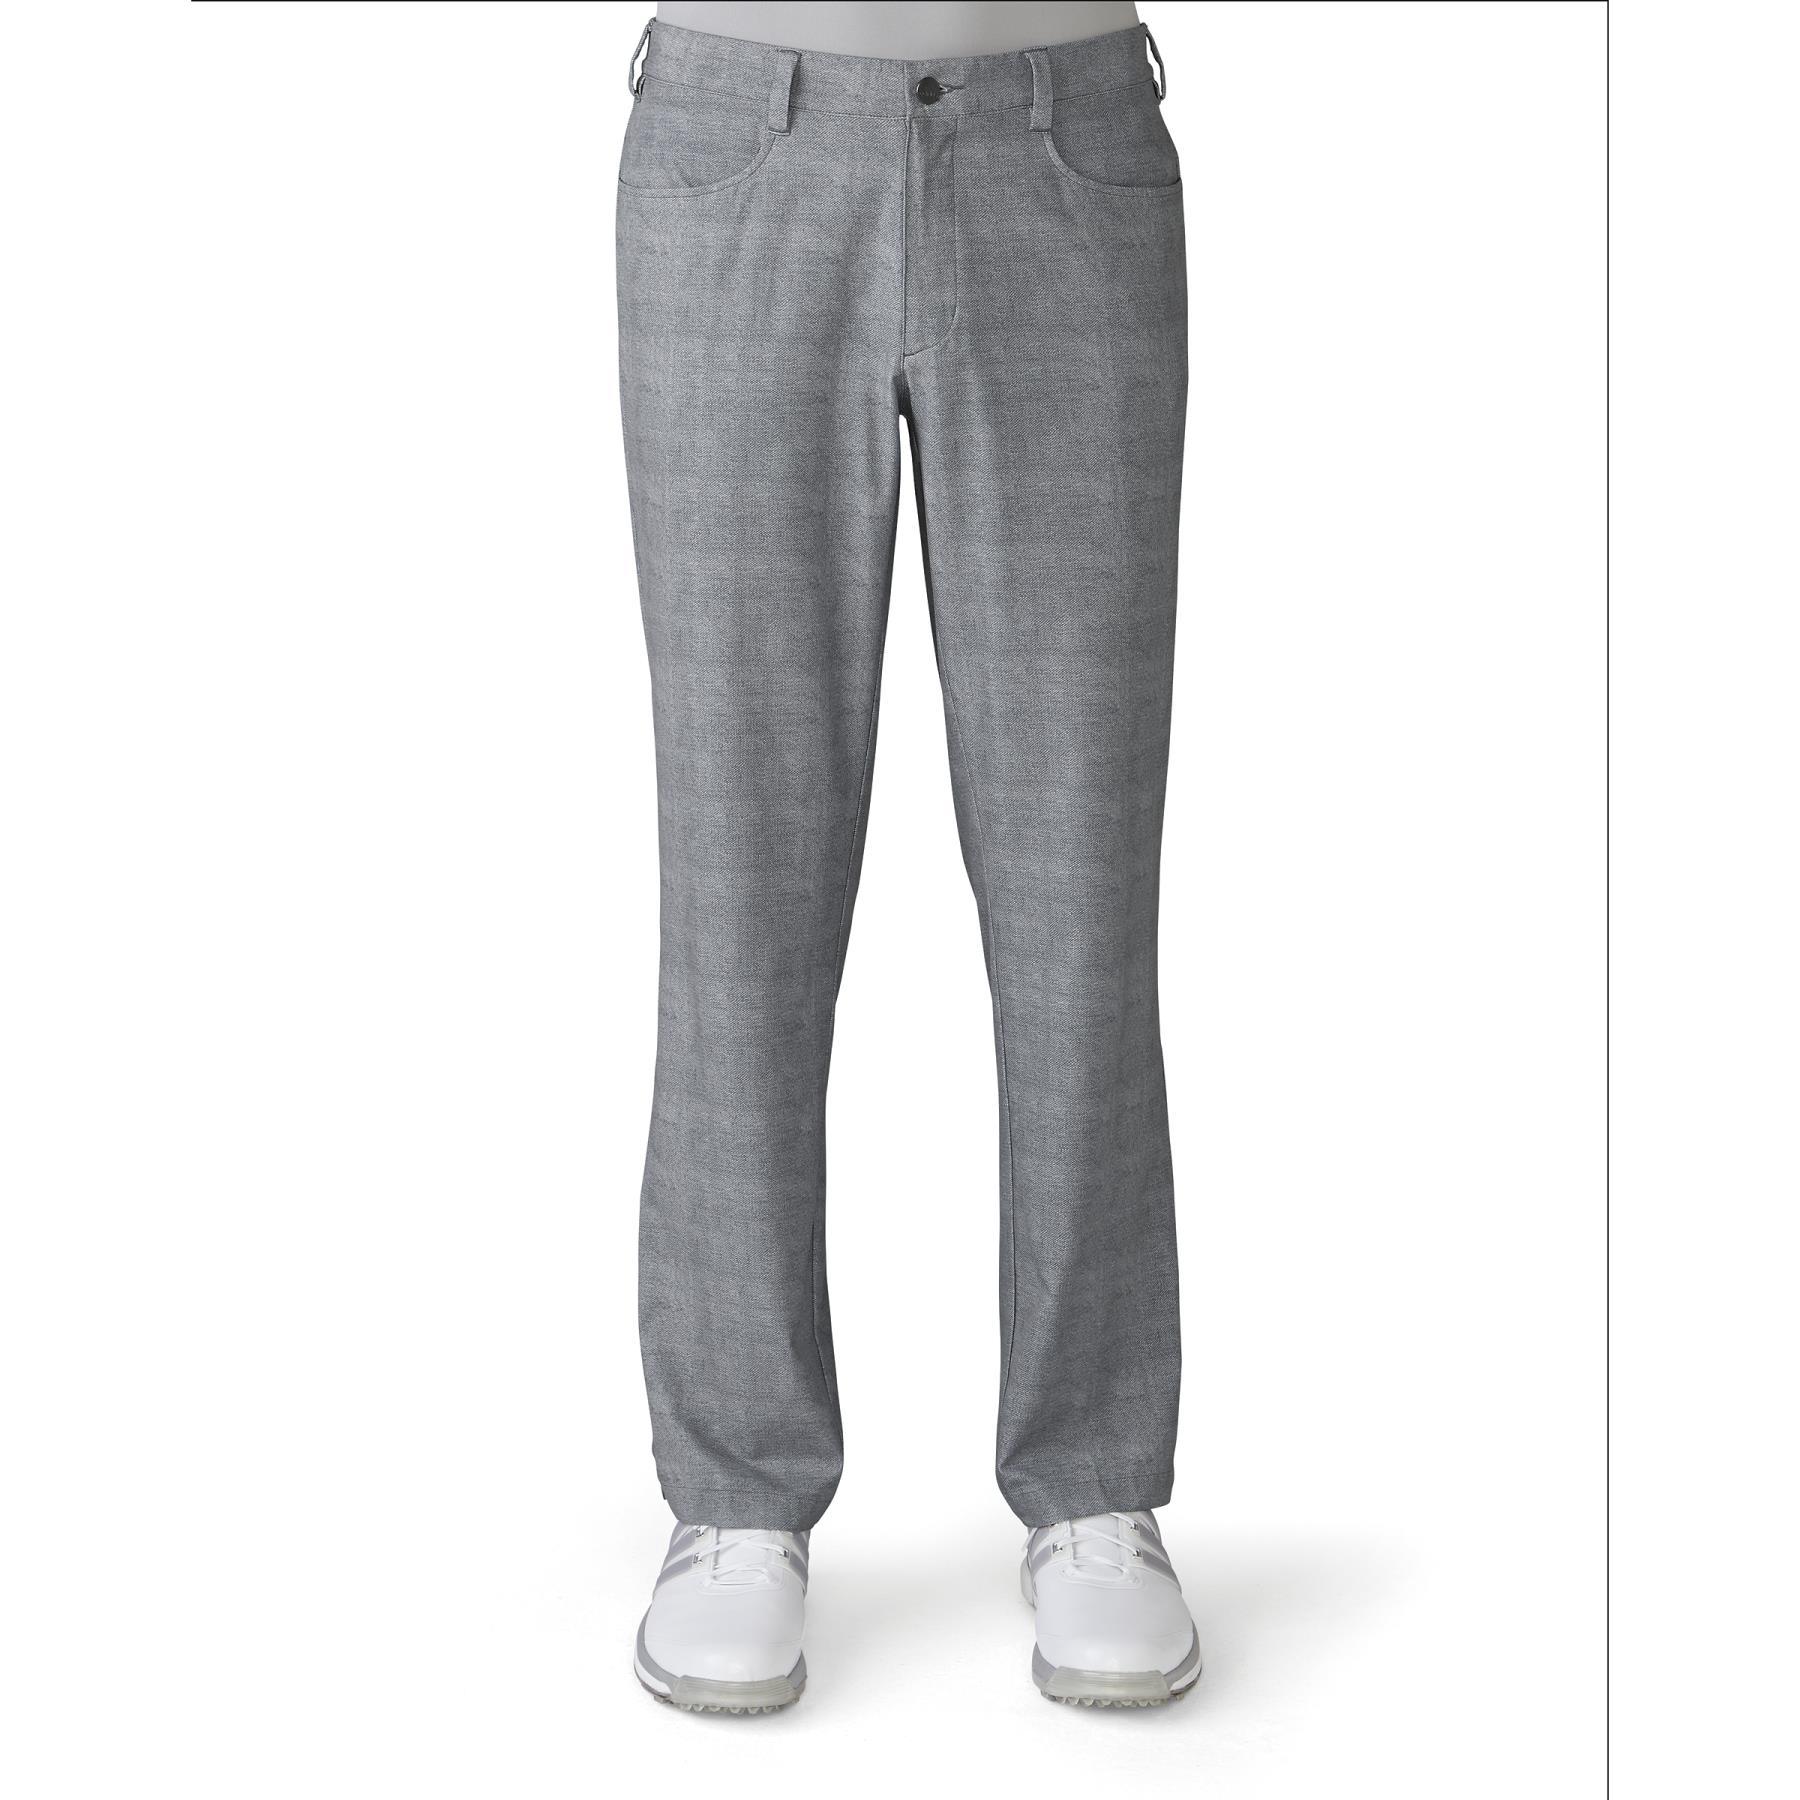 adidas Men's Ultimate Vista Grey Chino Pant